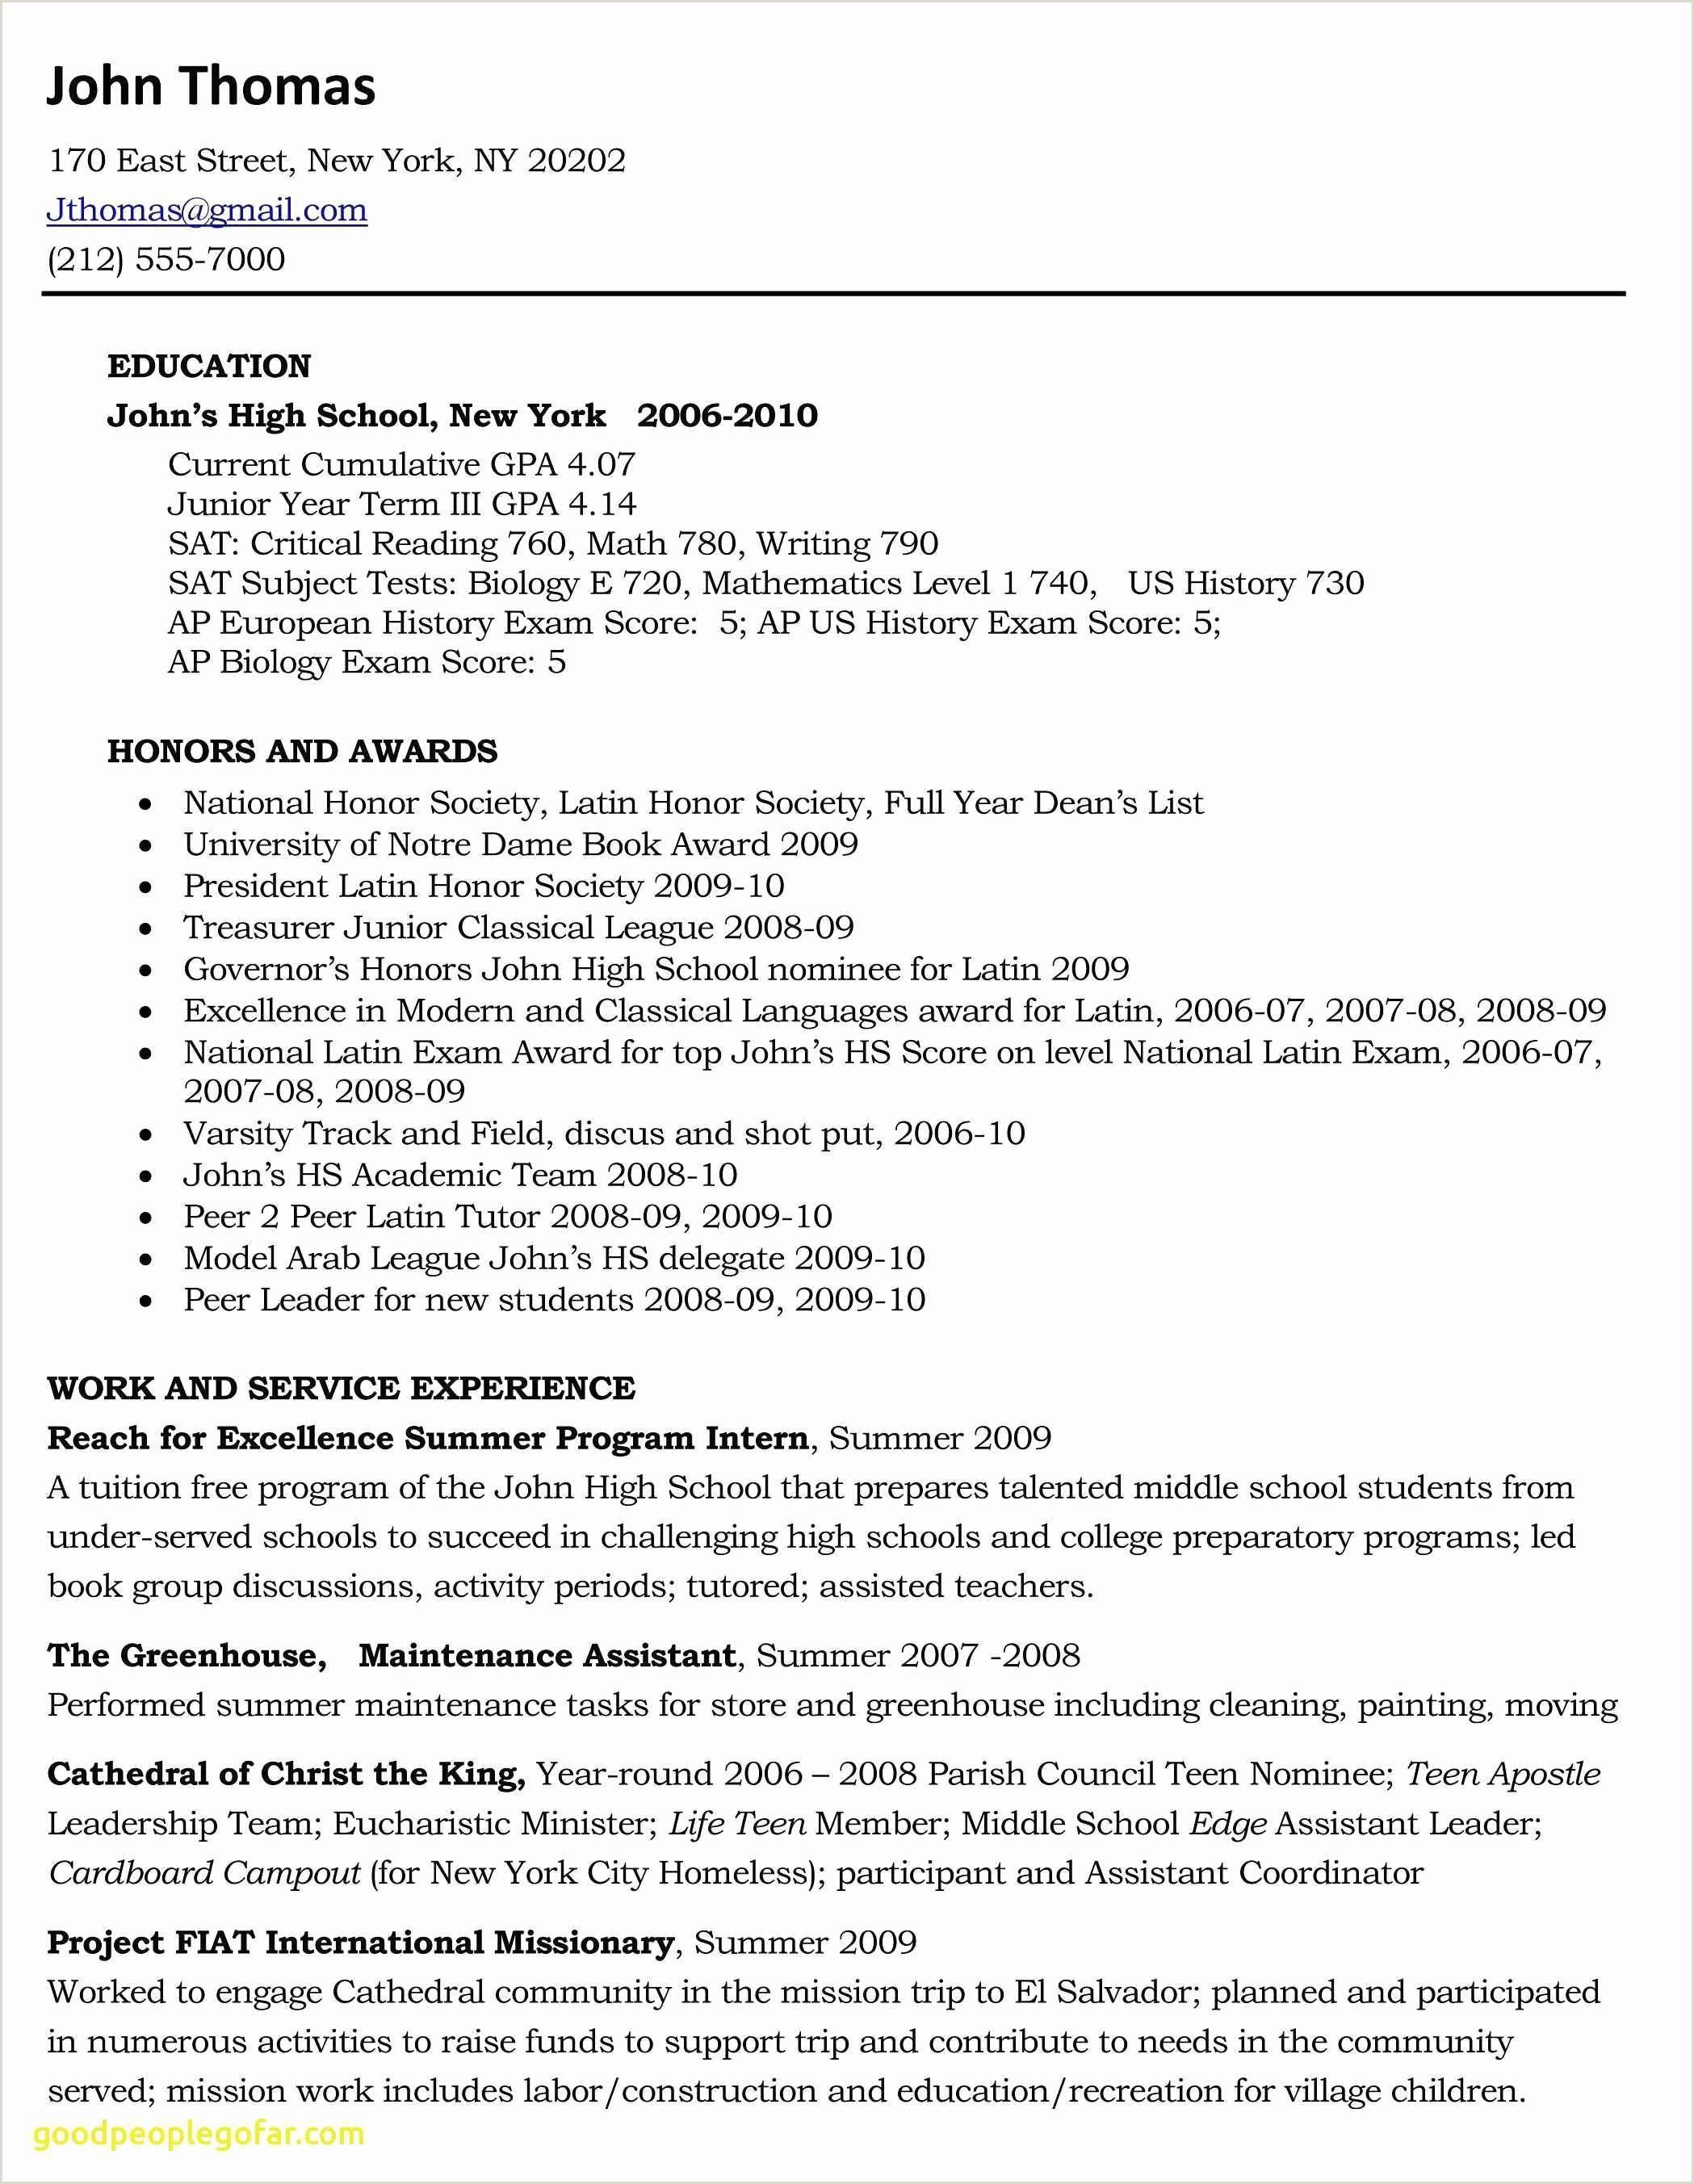 Affiliation Example Resume Exemple Cv Gratuit Simple Cv Resume Builder Best Template Cv